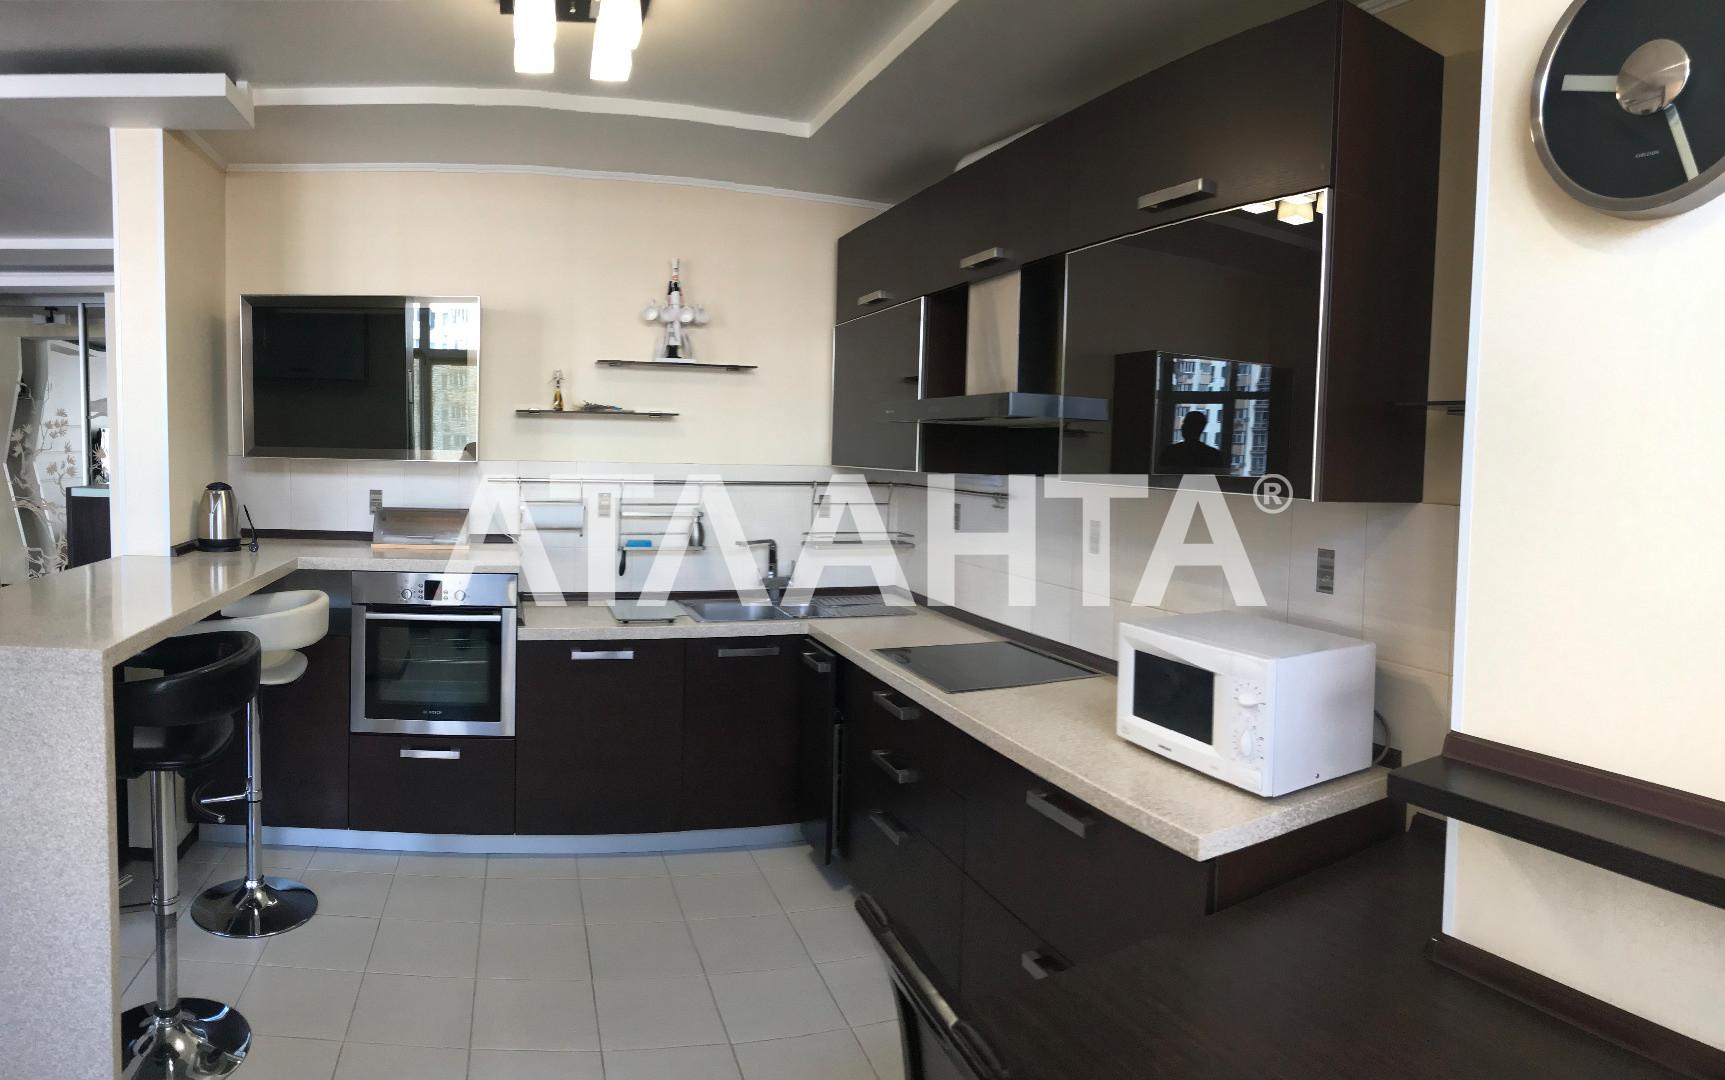 Продается 3-комнатная Квартира на ул. Ул. Ломоносова — 135 000 у.е. (фото №2)